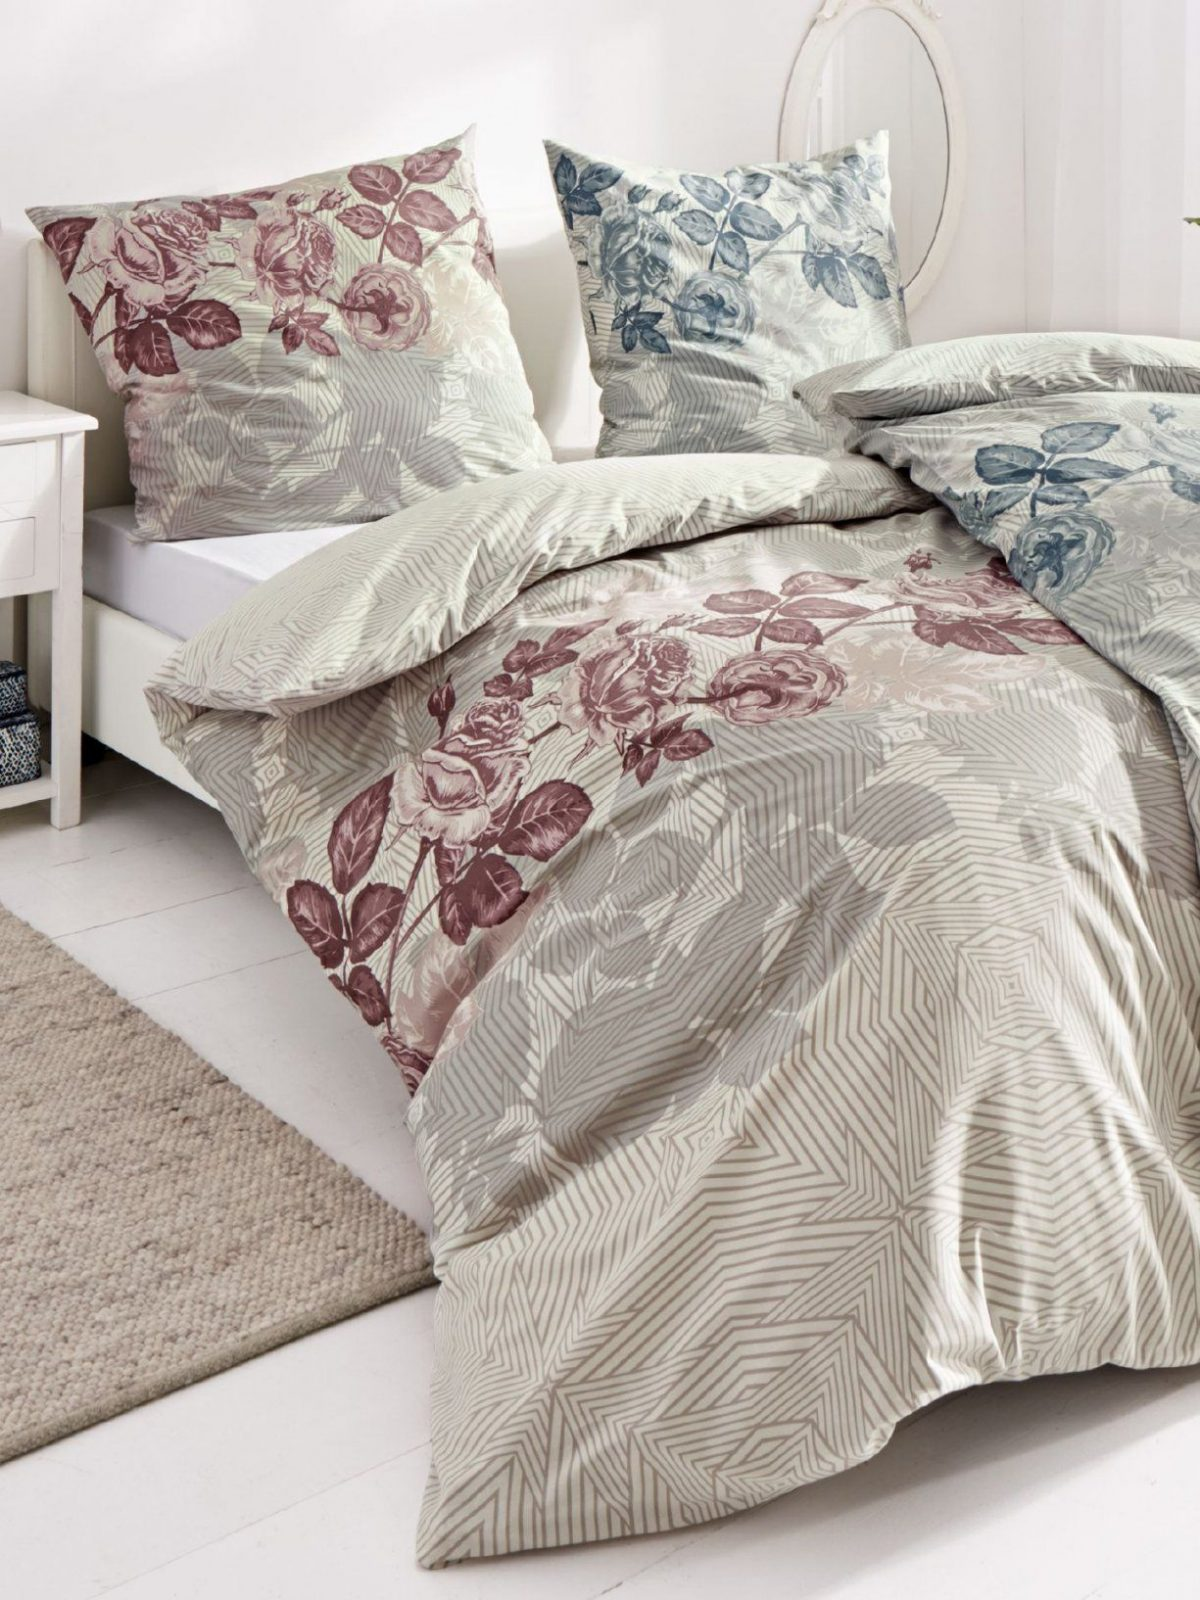 bettw sche totenkopf motiv haus design ideen. Black Bedroom Furniture Sets. Home Design Ideas